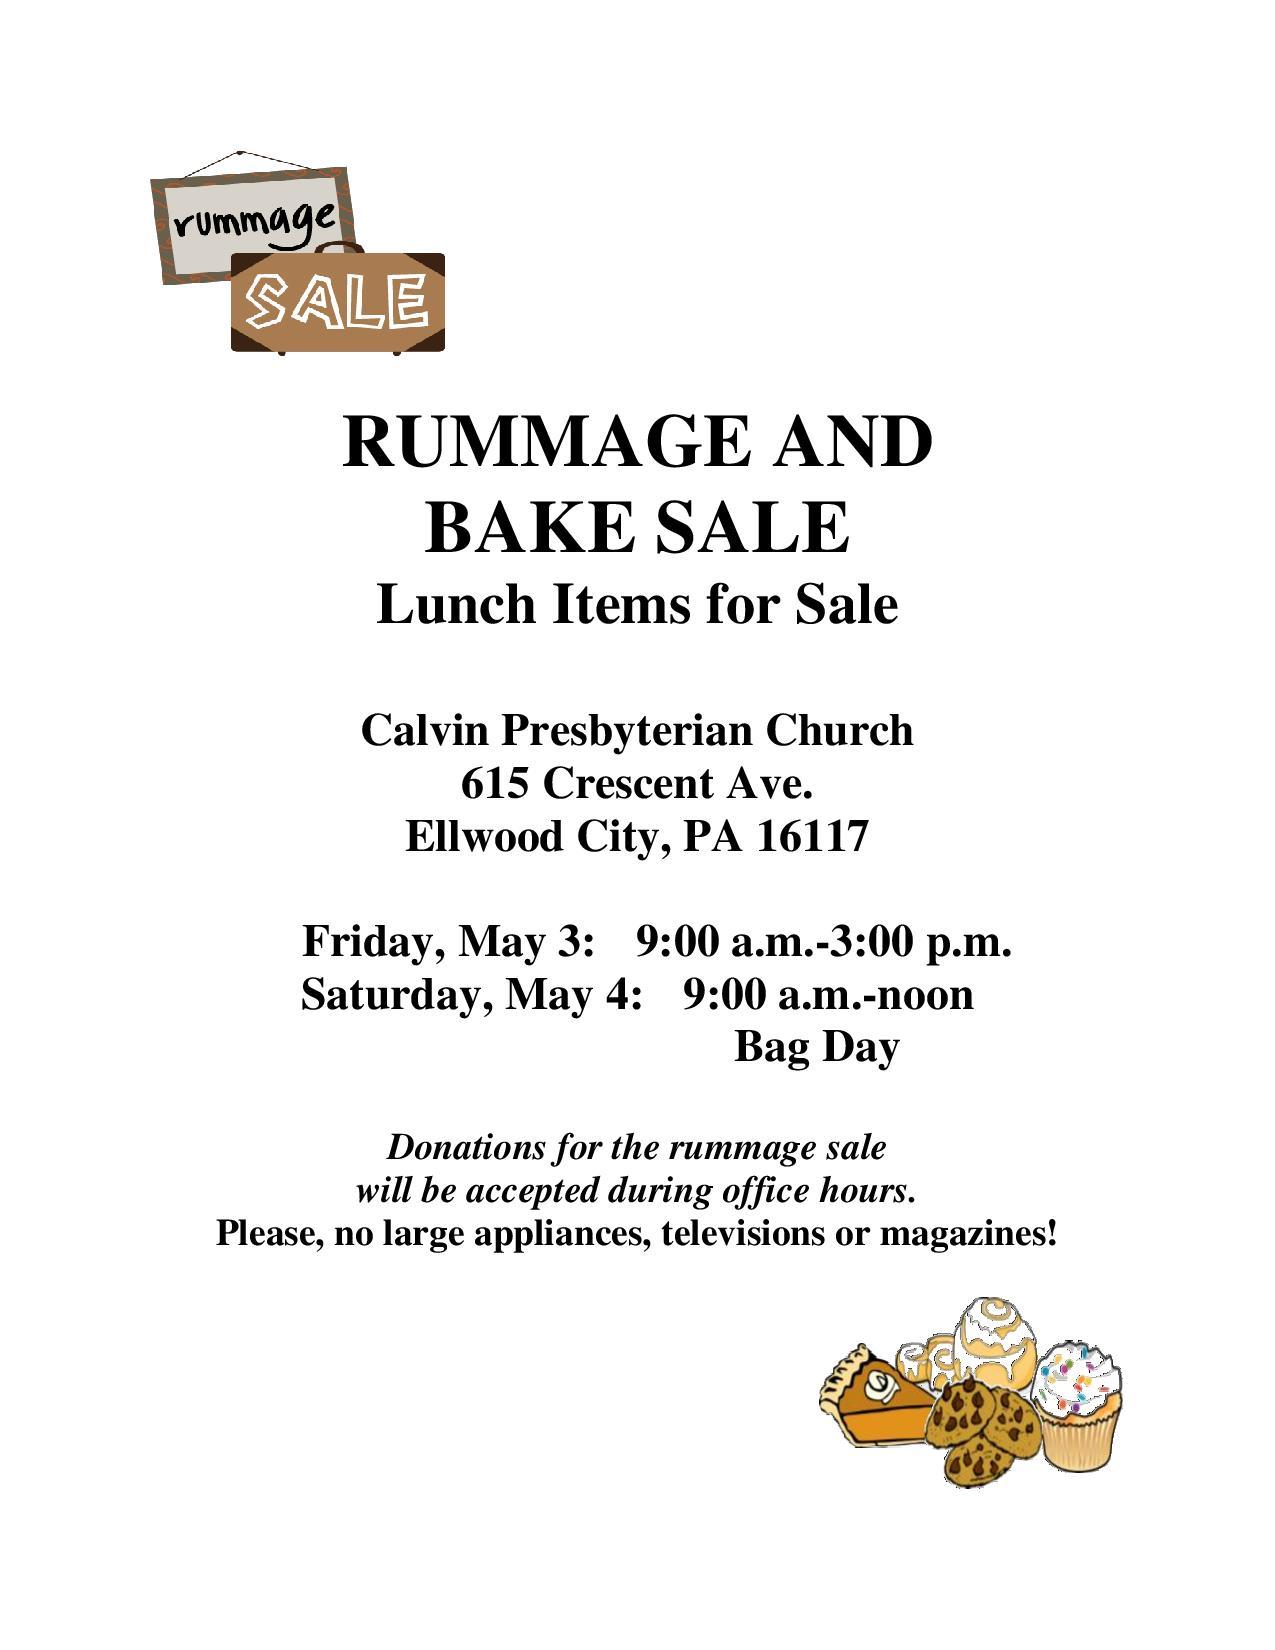 Calvin Presbyterian Church Set To Host Rummage And Bake Sale